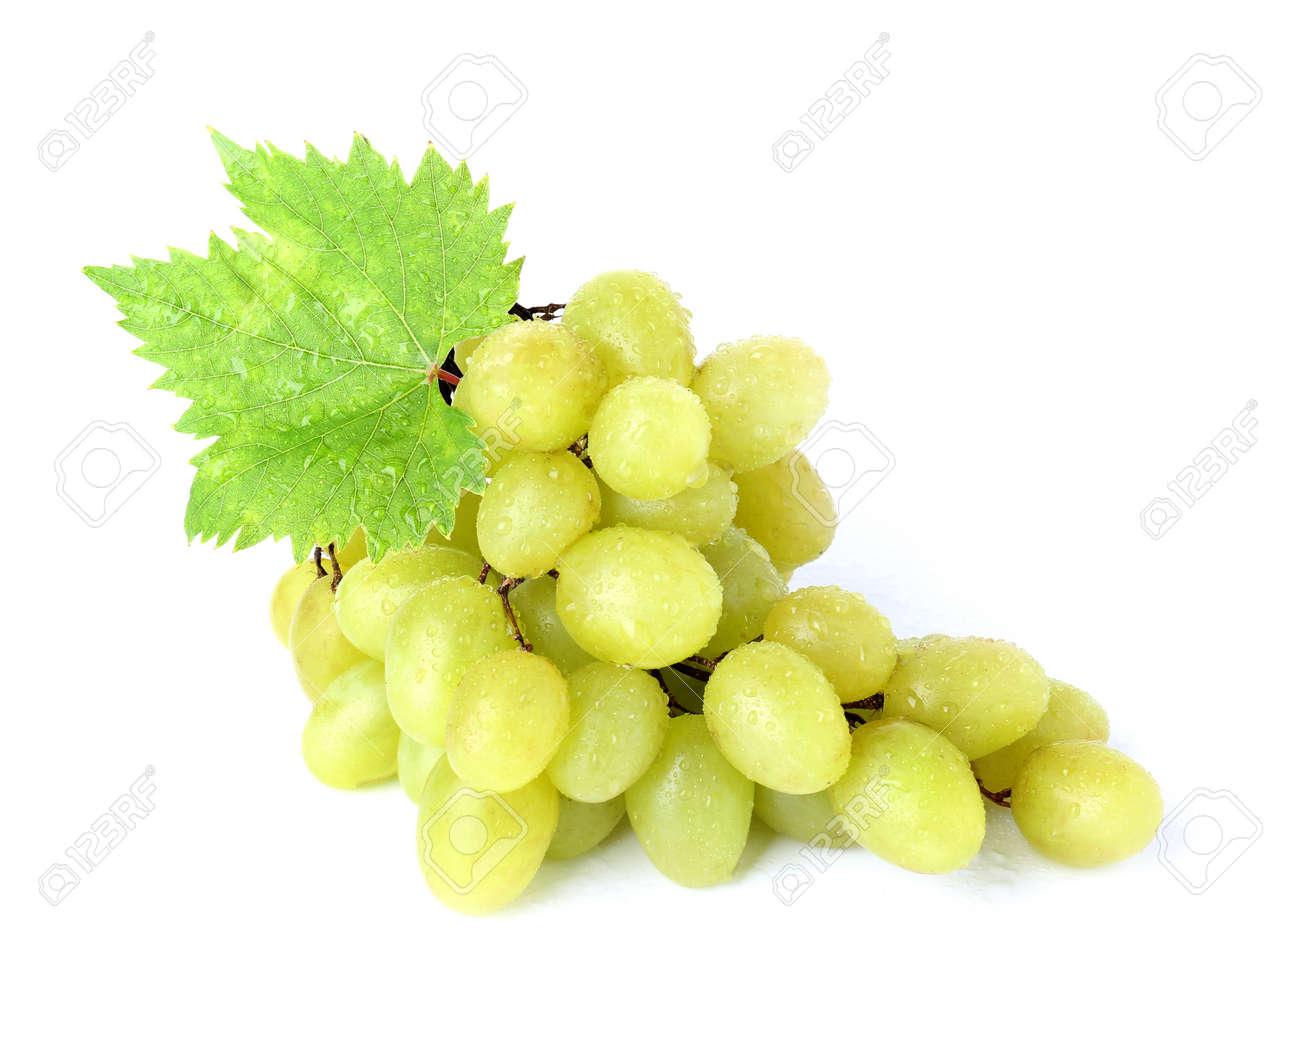 Tasty fresh grapes on white background - 165346003